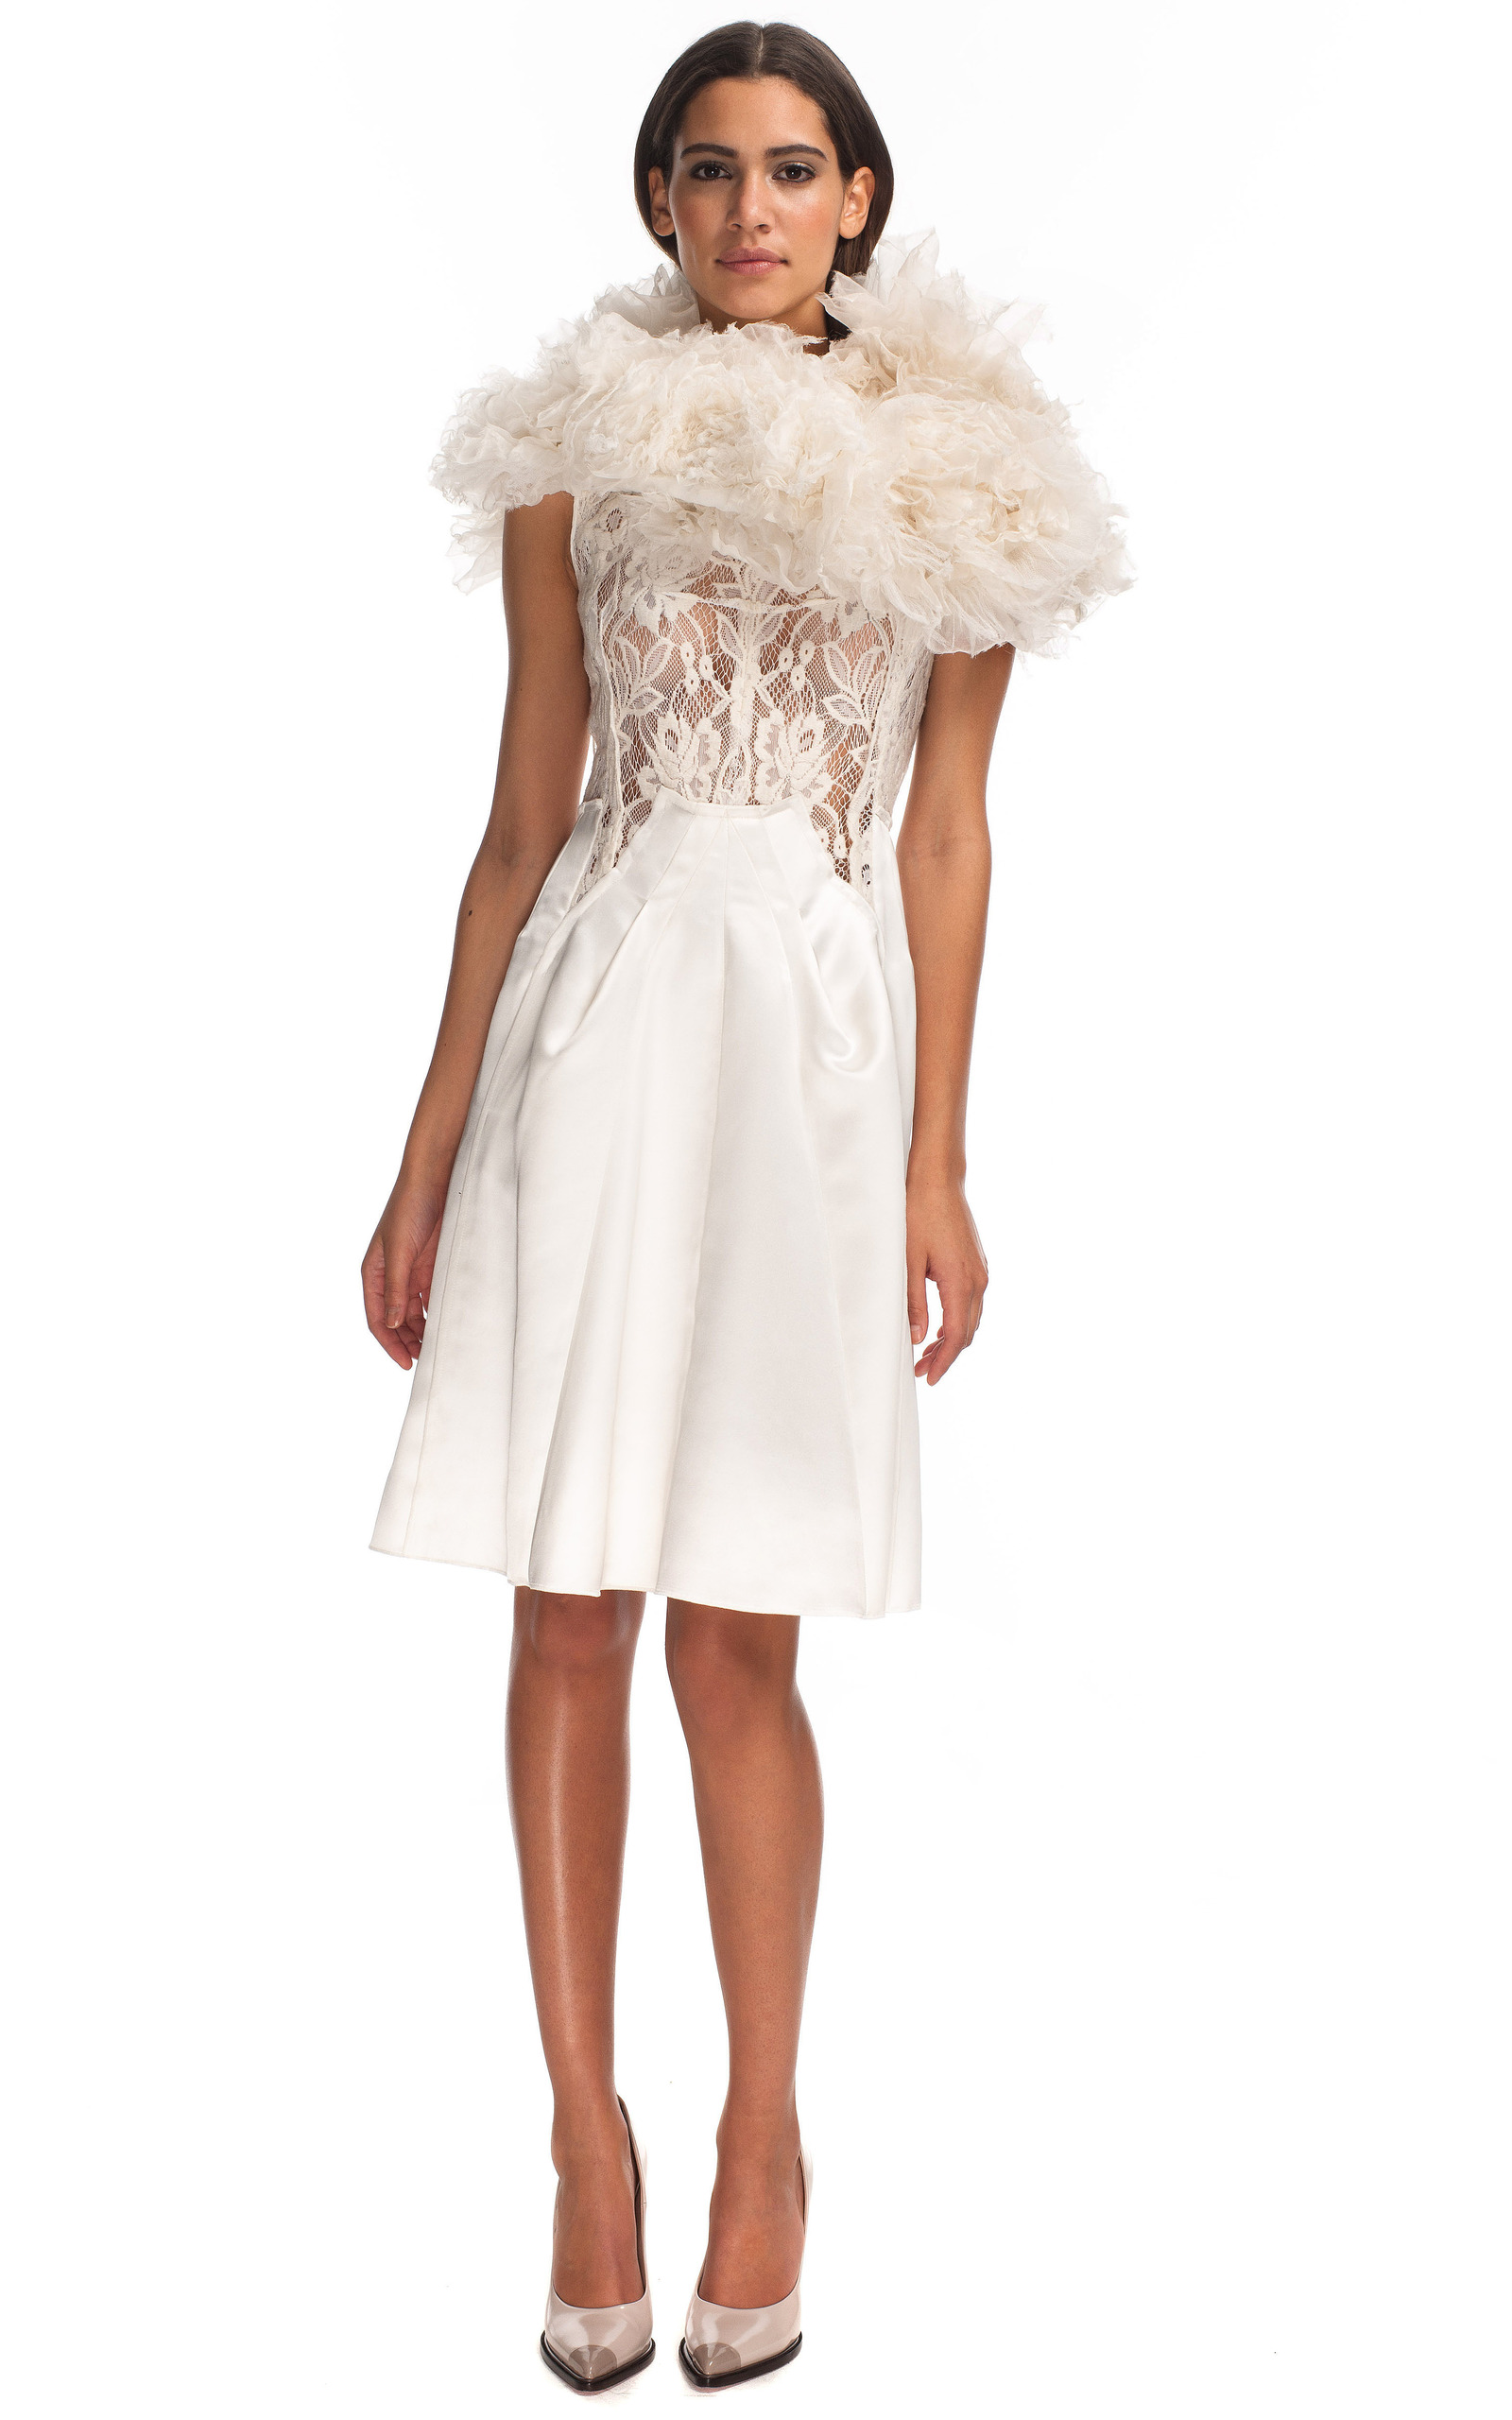 White Satin Cocktail Dress